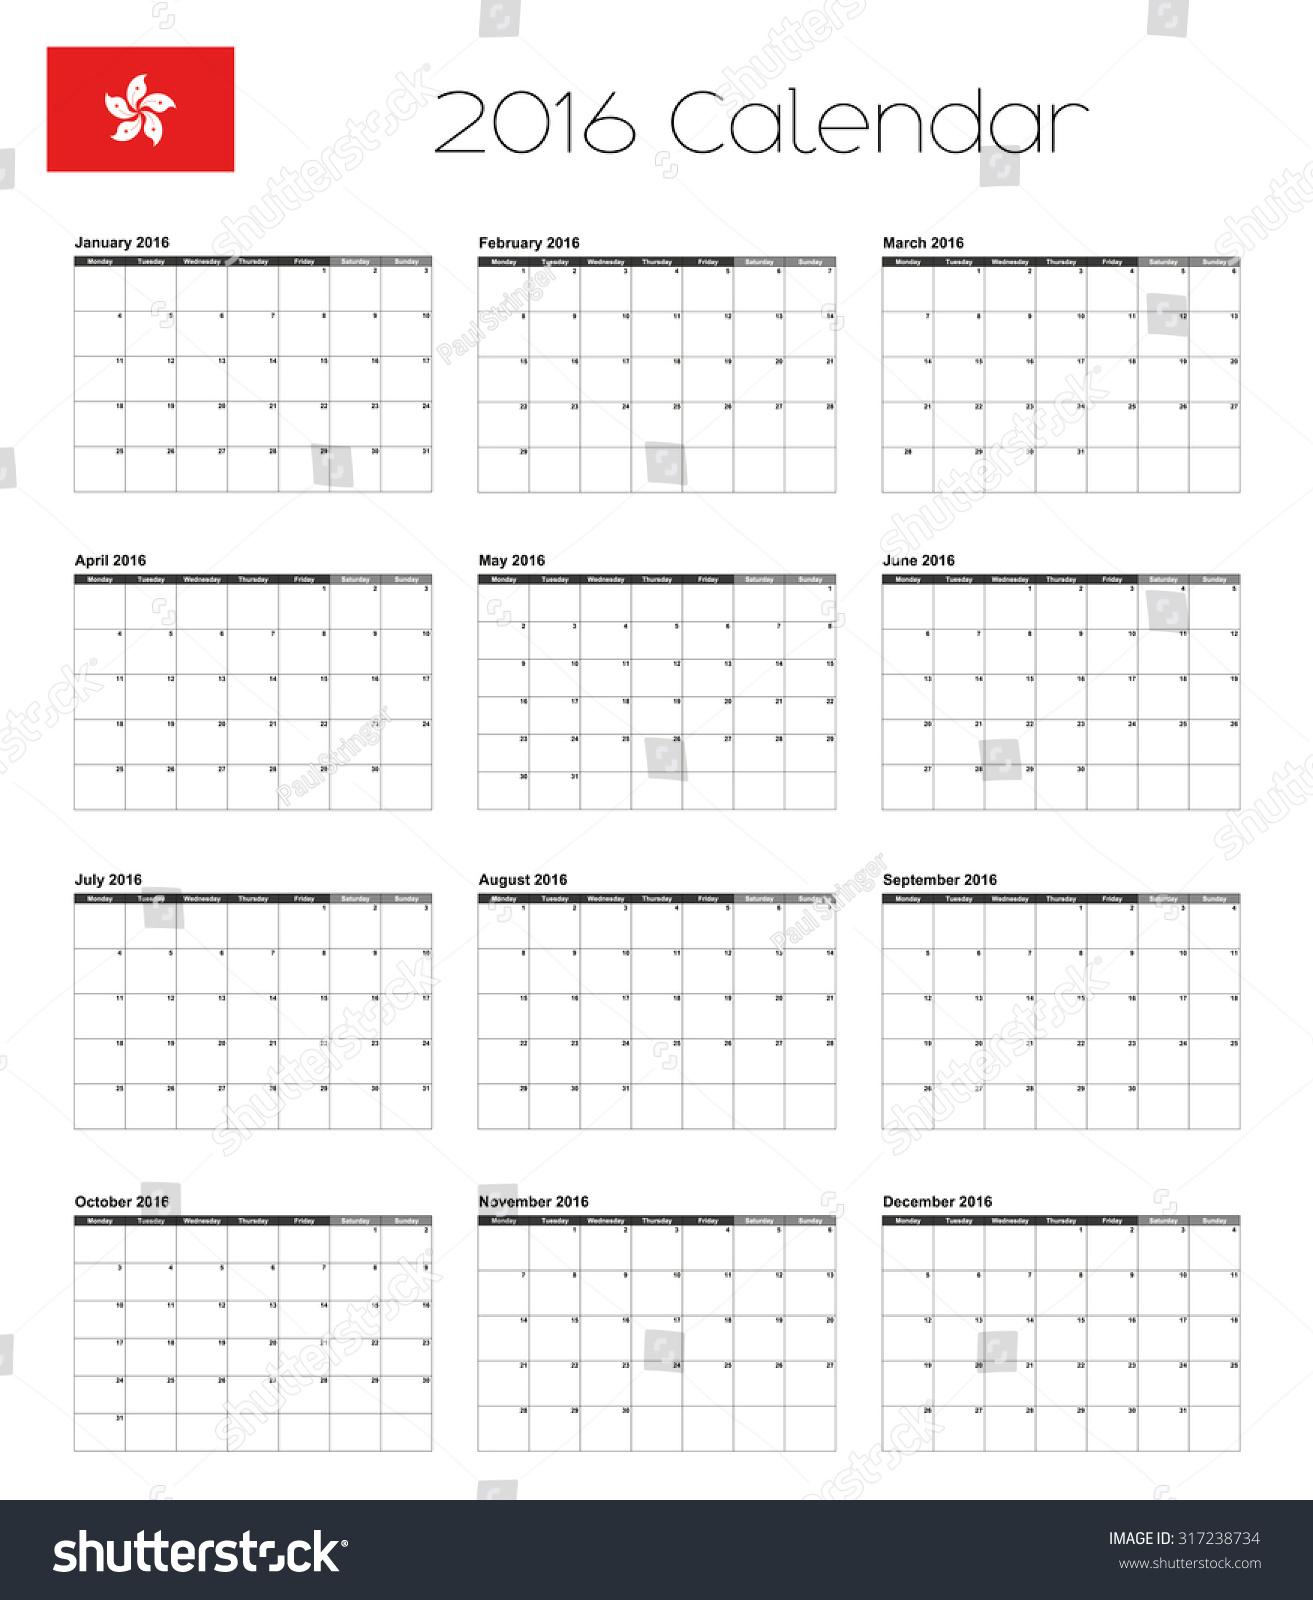 Weekly Calendar Uae : Calendar flag hong kong stock illustration